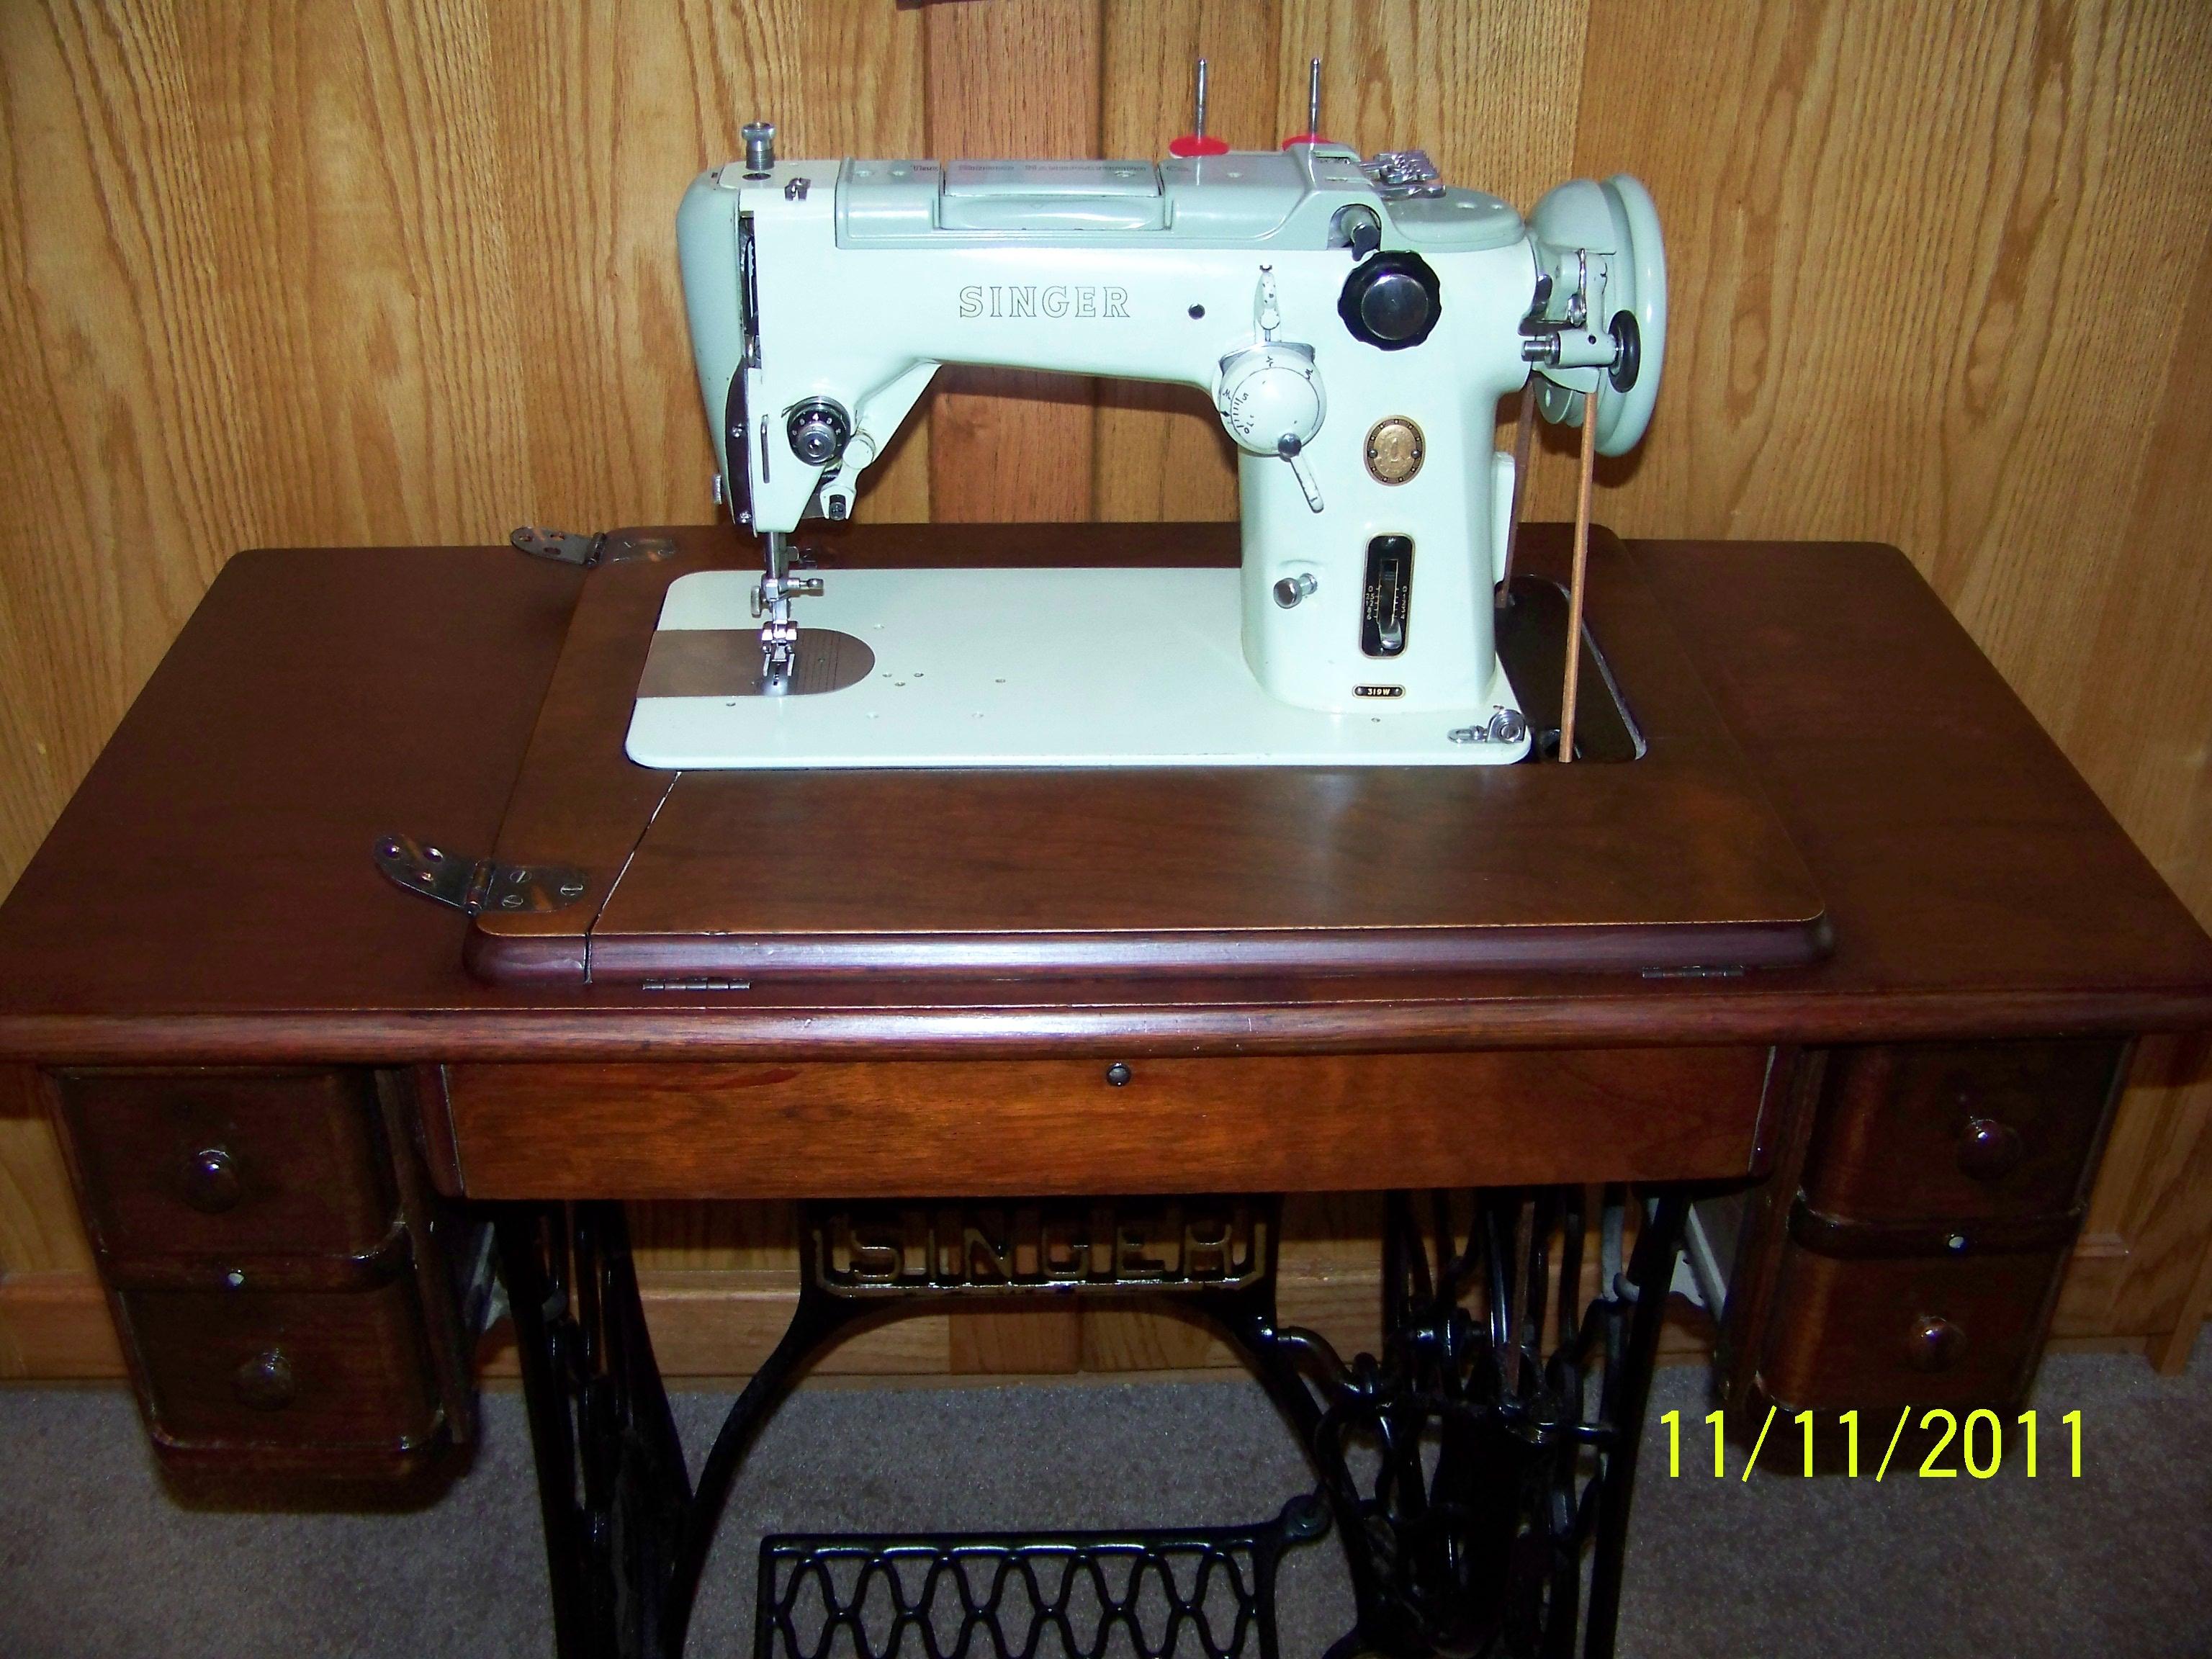 Vintage Sewing Machine Shop Machine Photos - Page 15